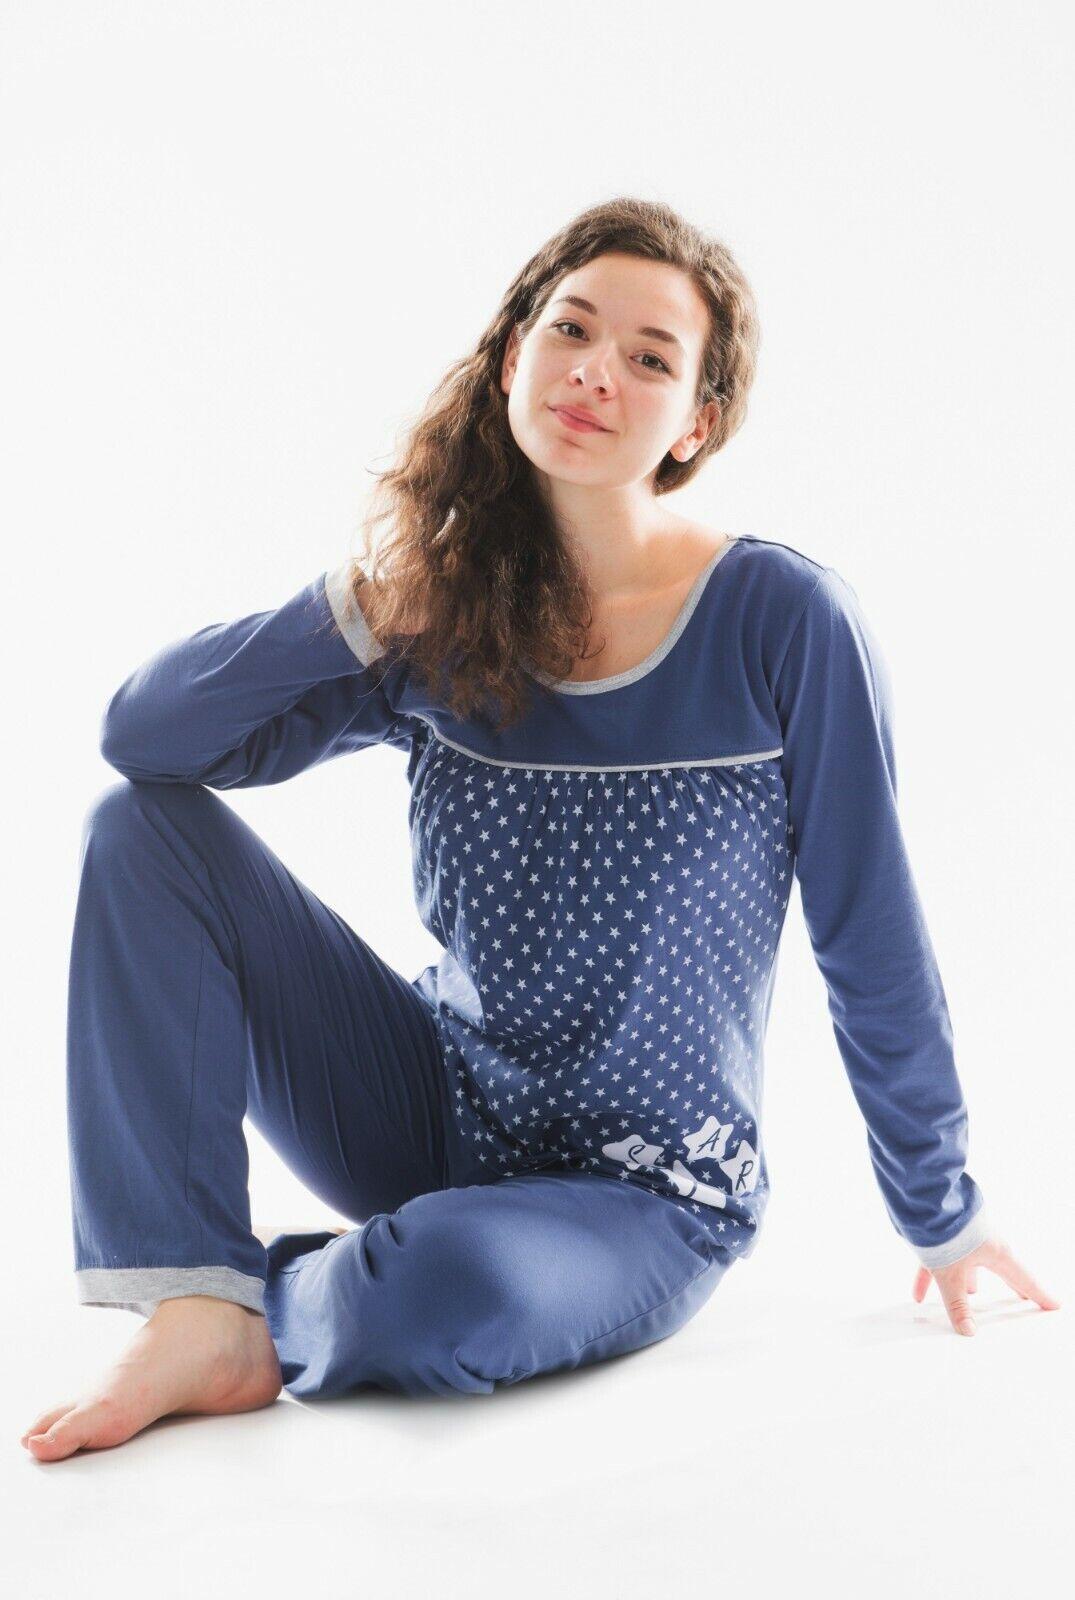 Damen Pyjama / Schlafanzug , reine Baumwolle-Jersey. Artikel SUN7aV